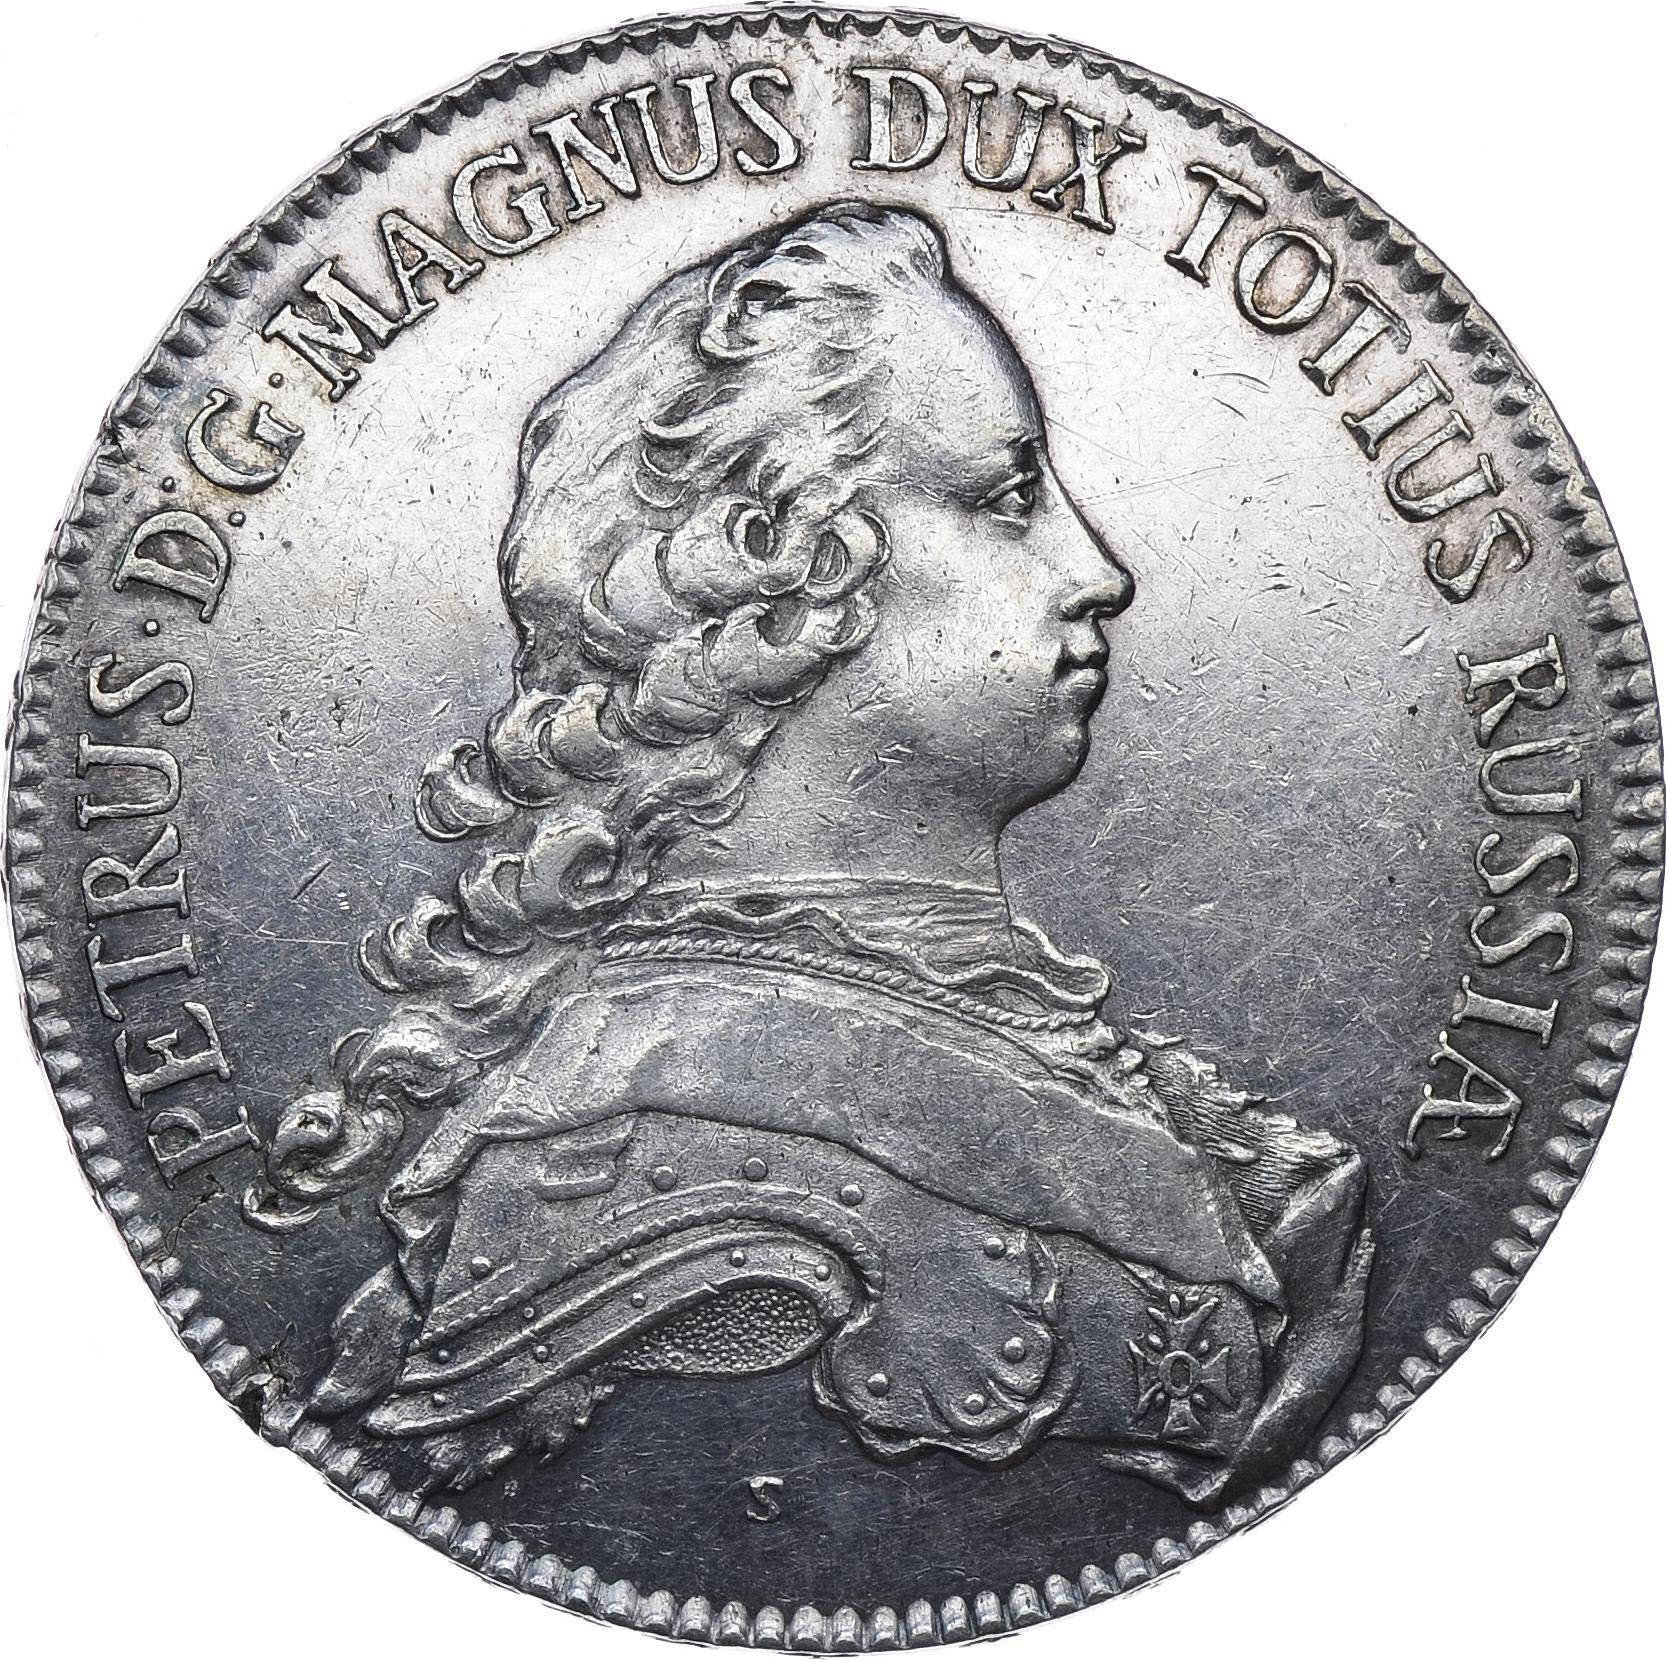 Талер 1753 г. P. Альбертусталер (Елизавета I). Альбертусталер. Портрет шире